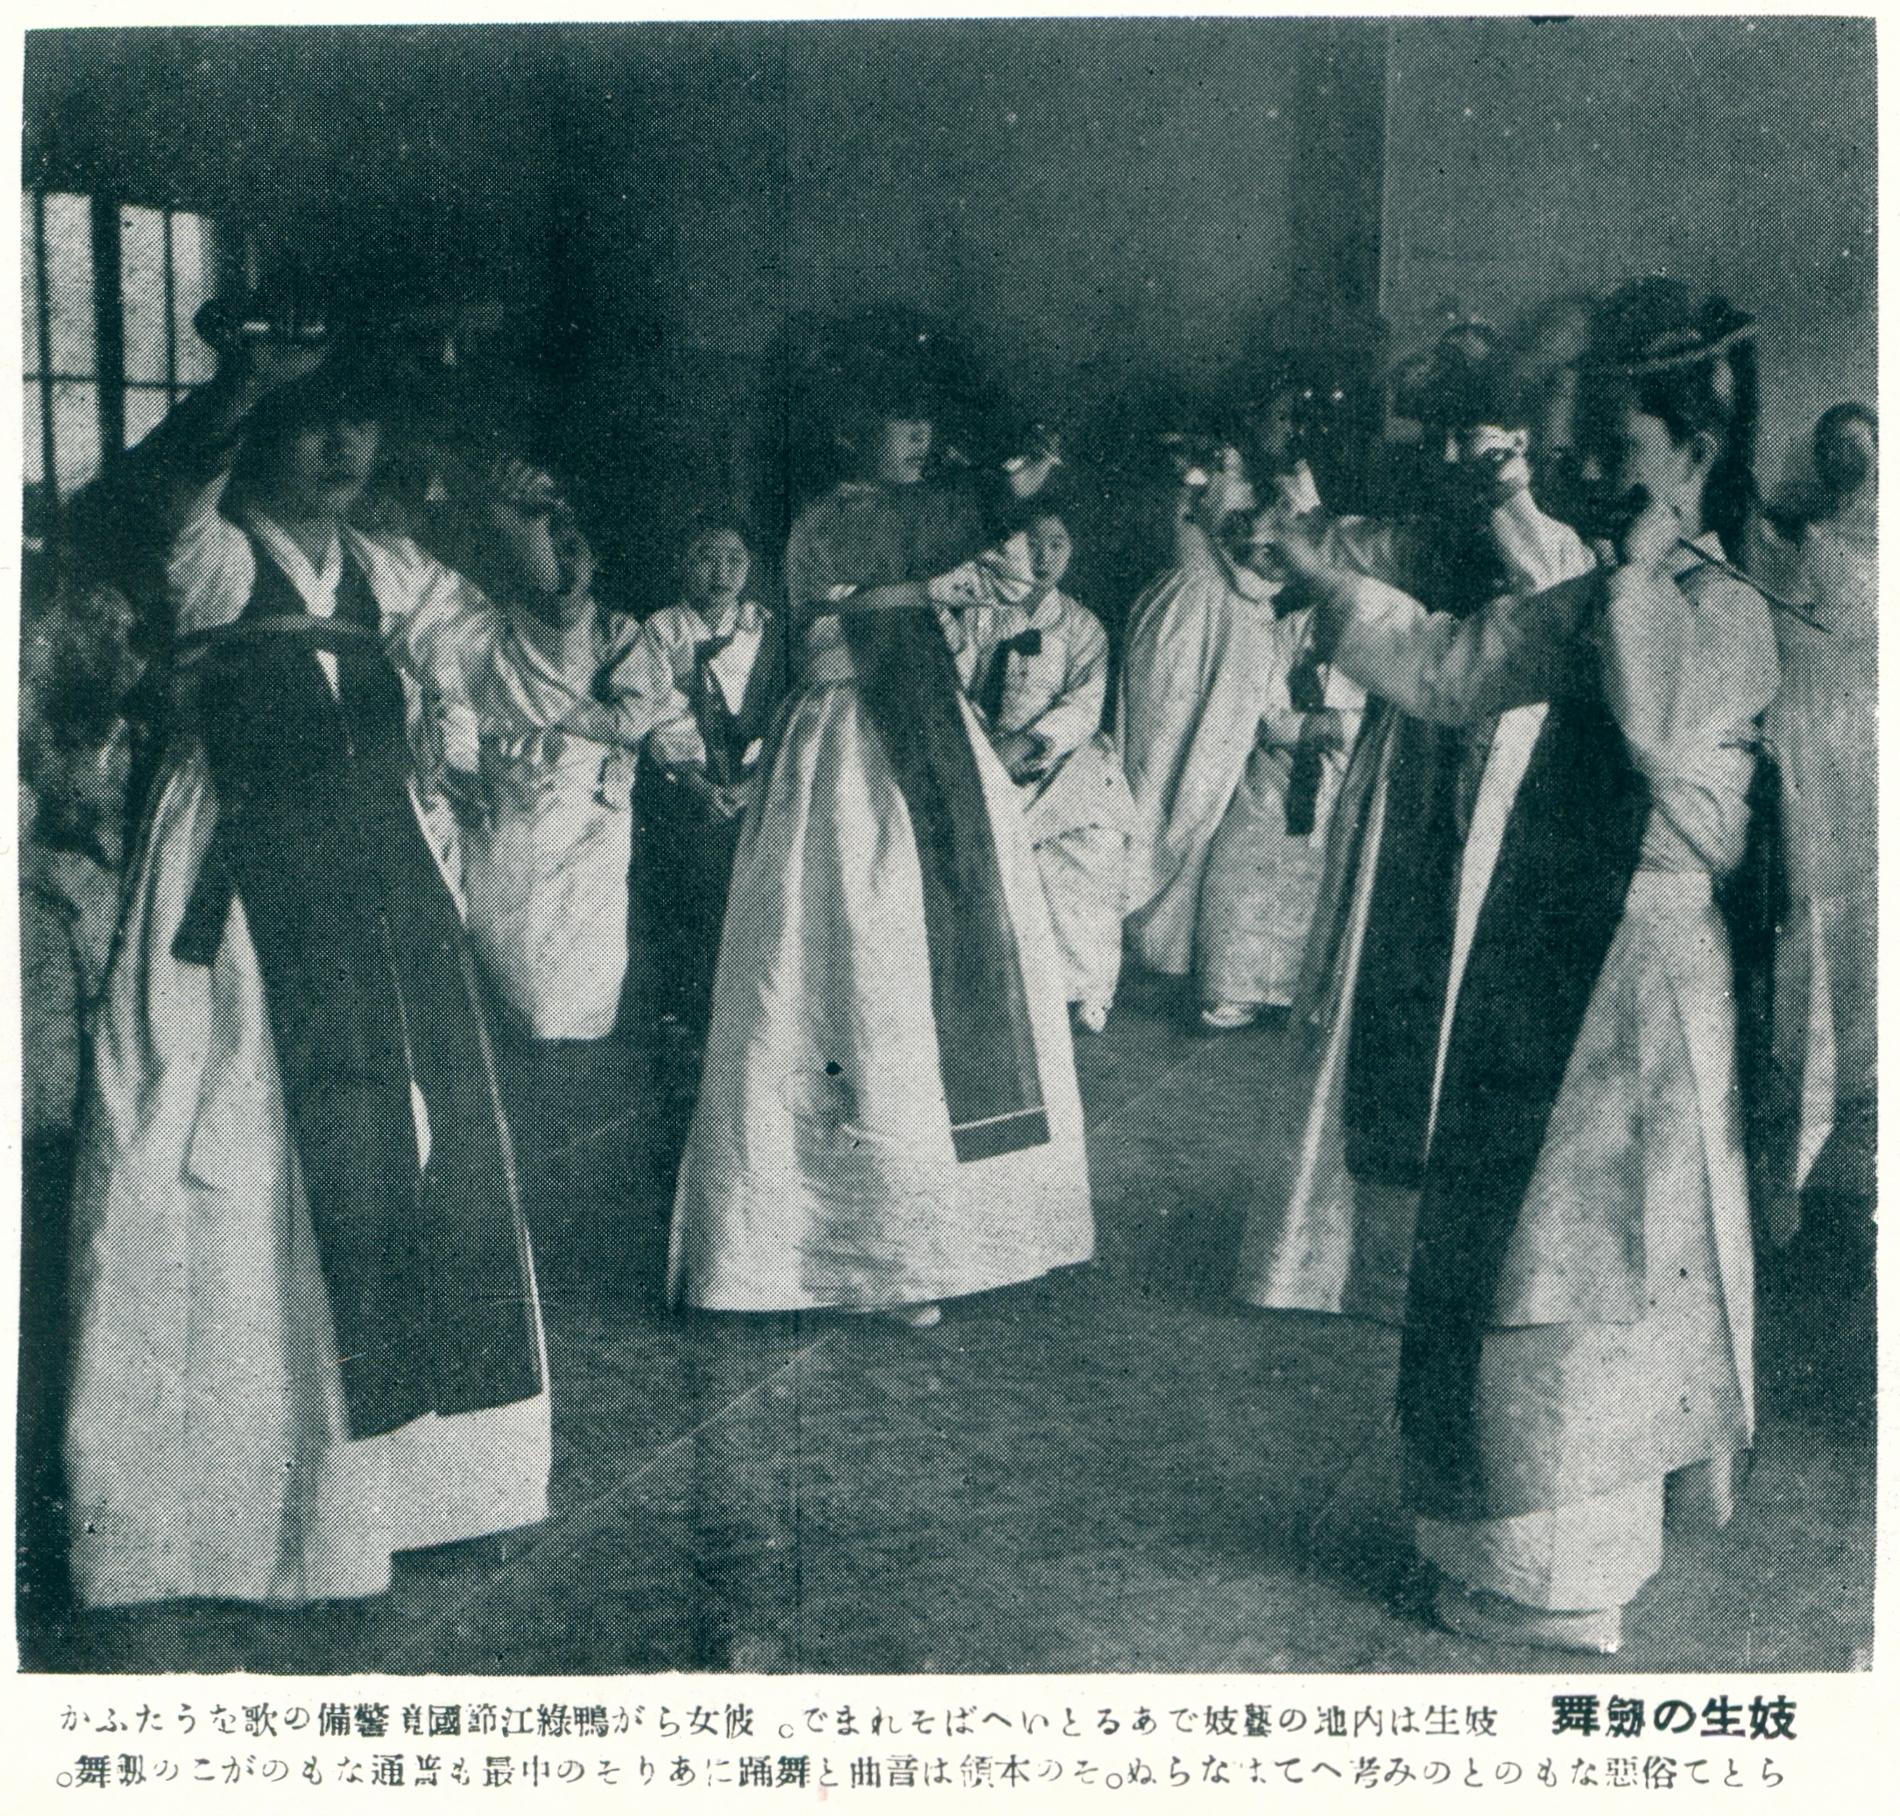 http://archive.museum.seoul.kr:8090/ARCHIVE_DATA/master/1011/A000000271/16f0b3ec-d0e2-444e-95a1-175770ac2419.jpg